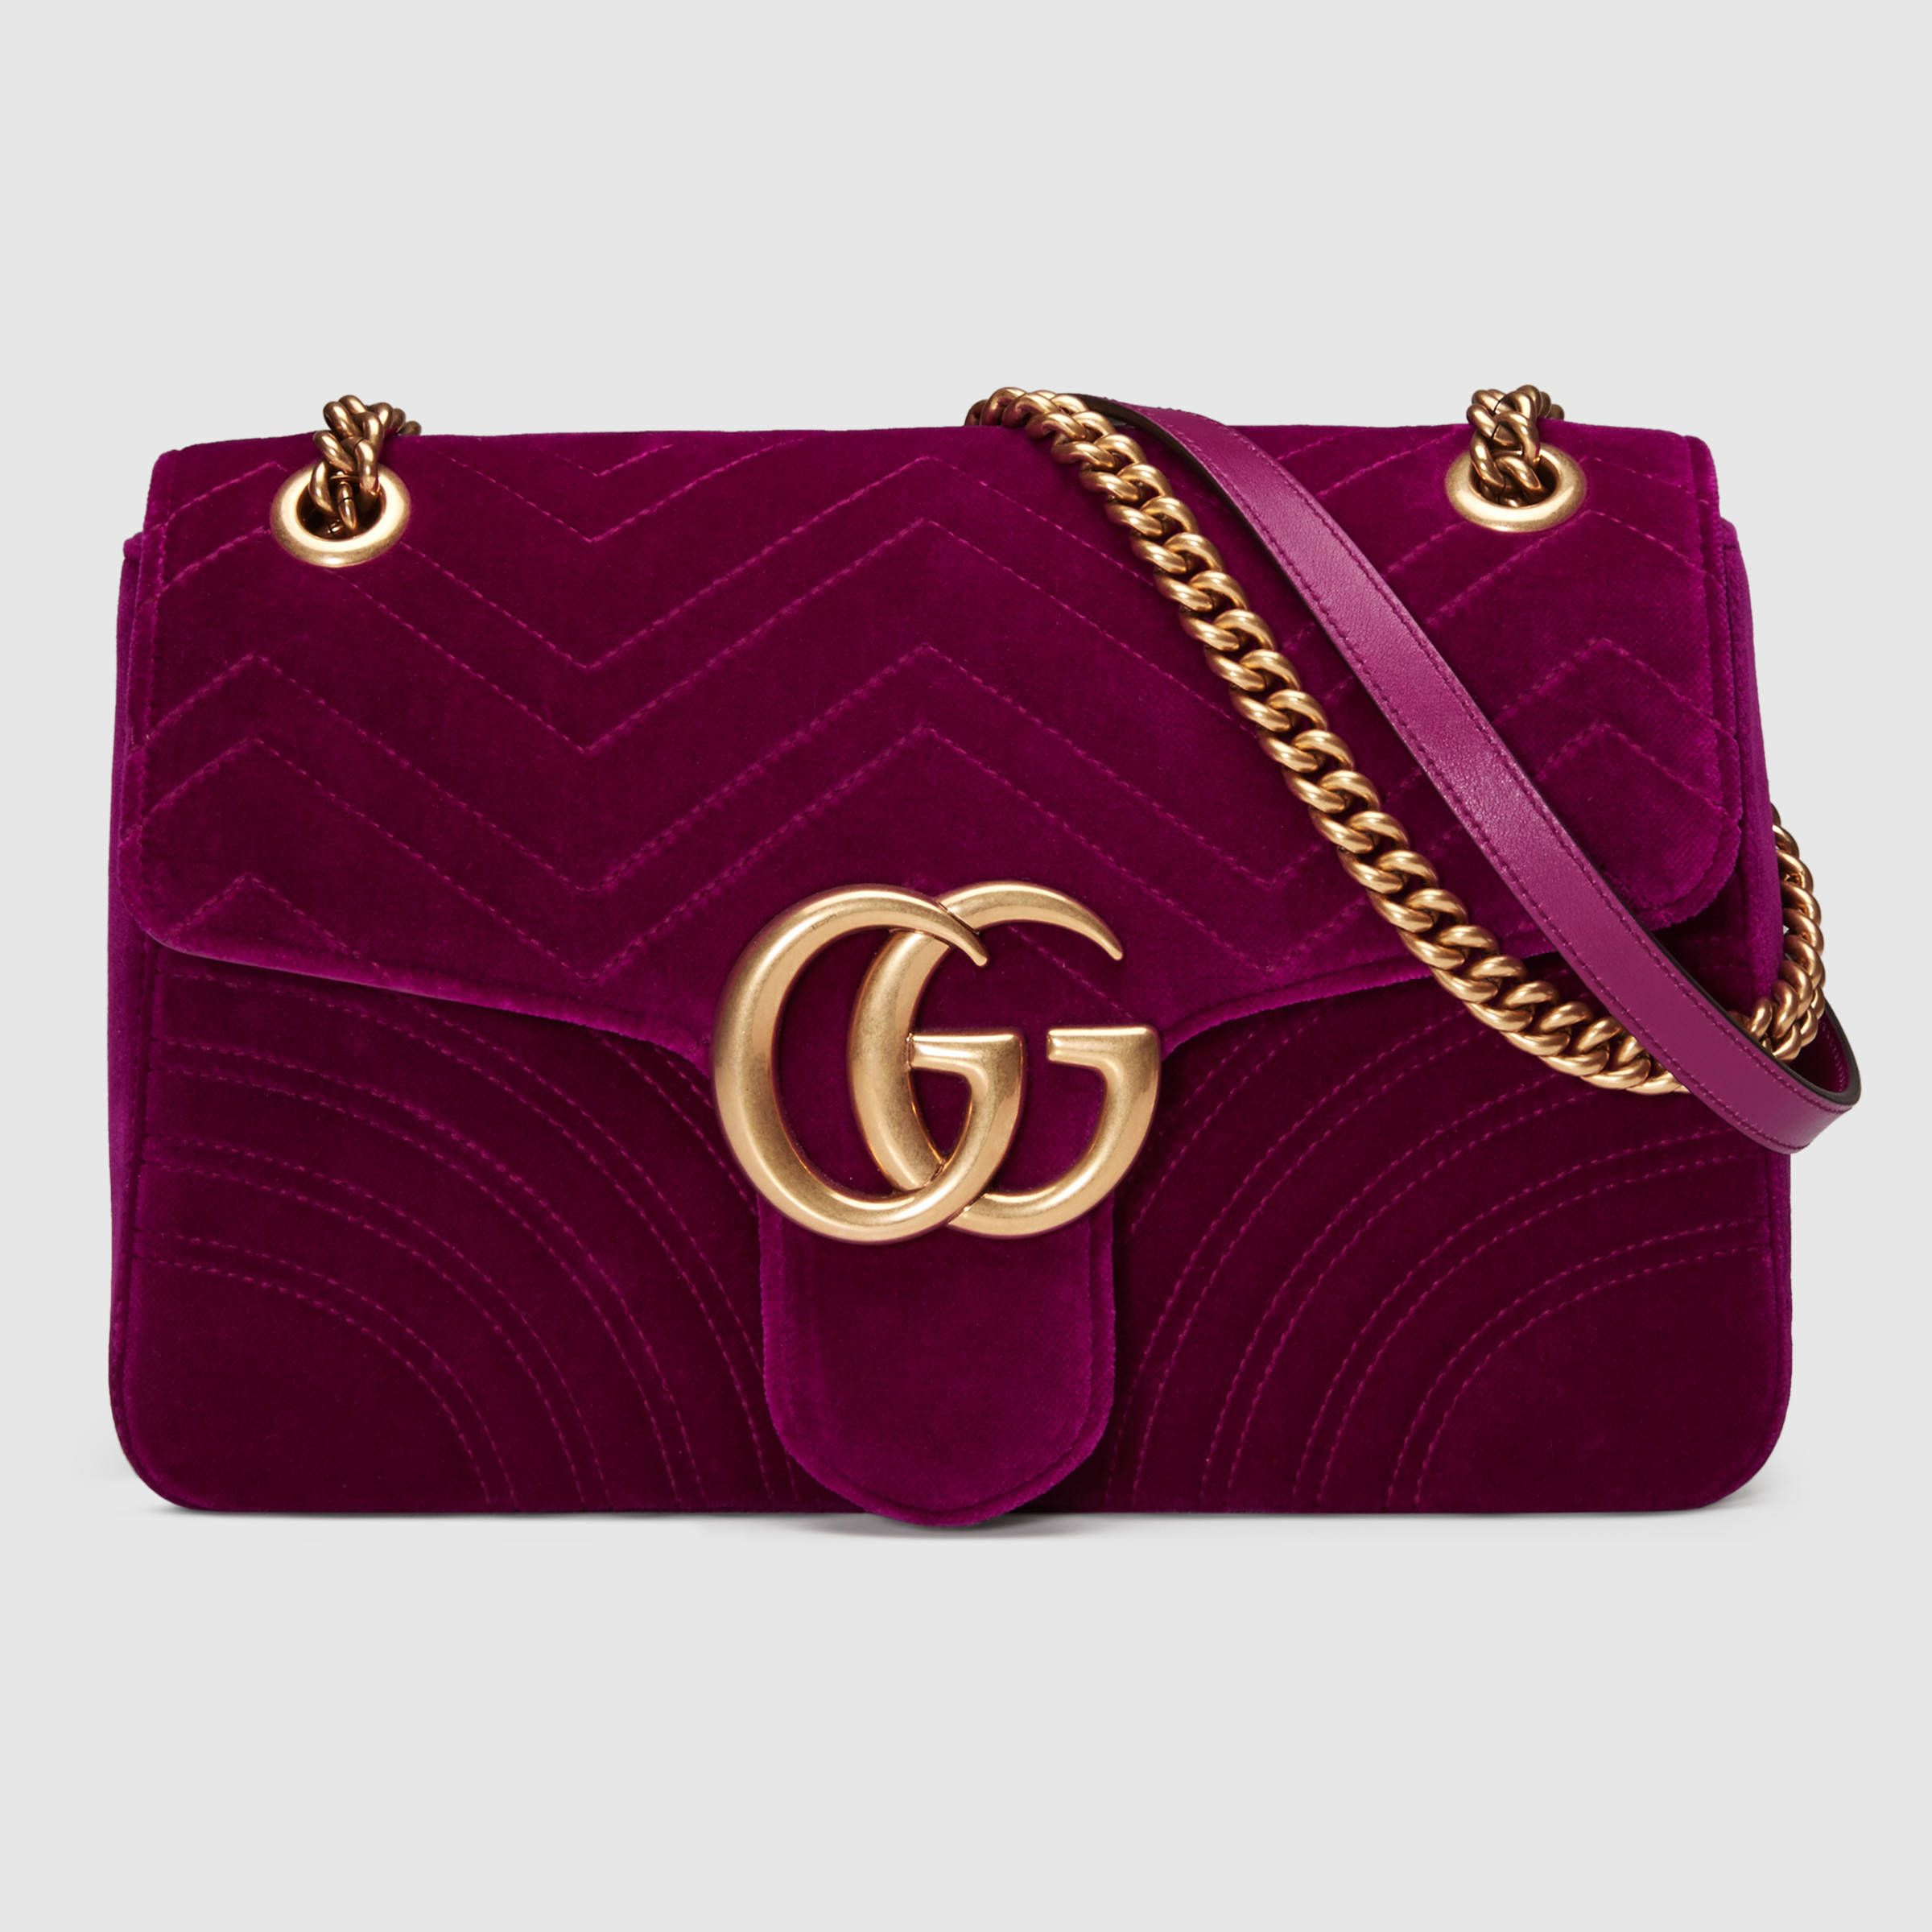 velvet gucci gg bag handbags pinterest gucci. Black Bedroom Furniture Sets. Home Design Ideas